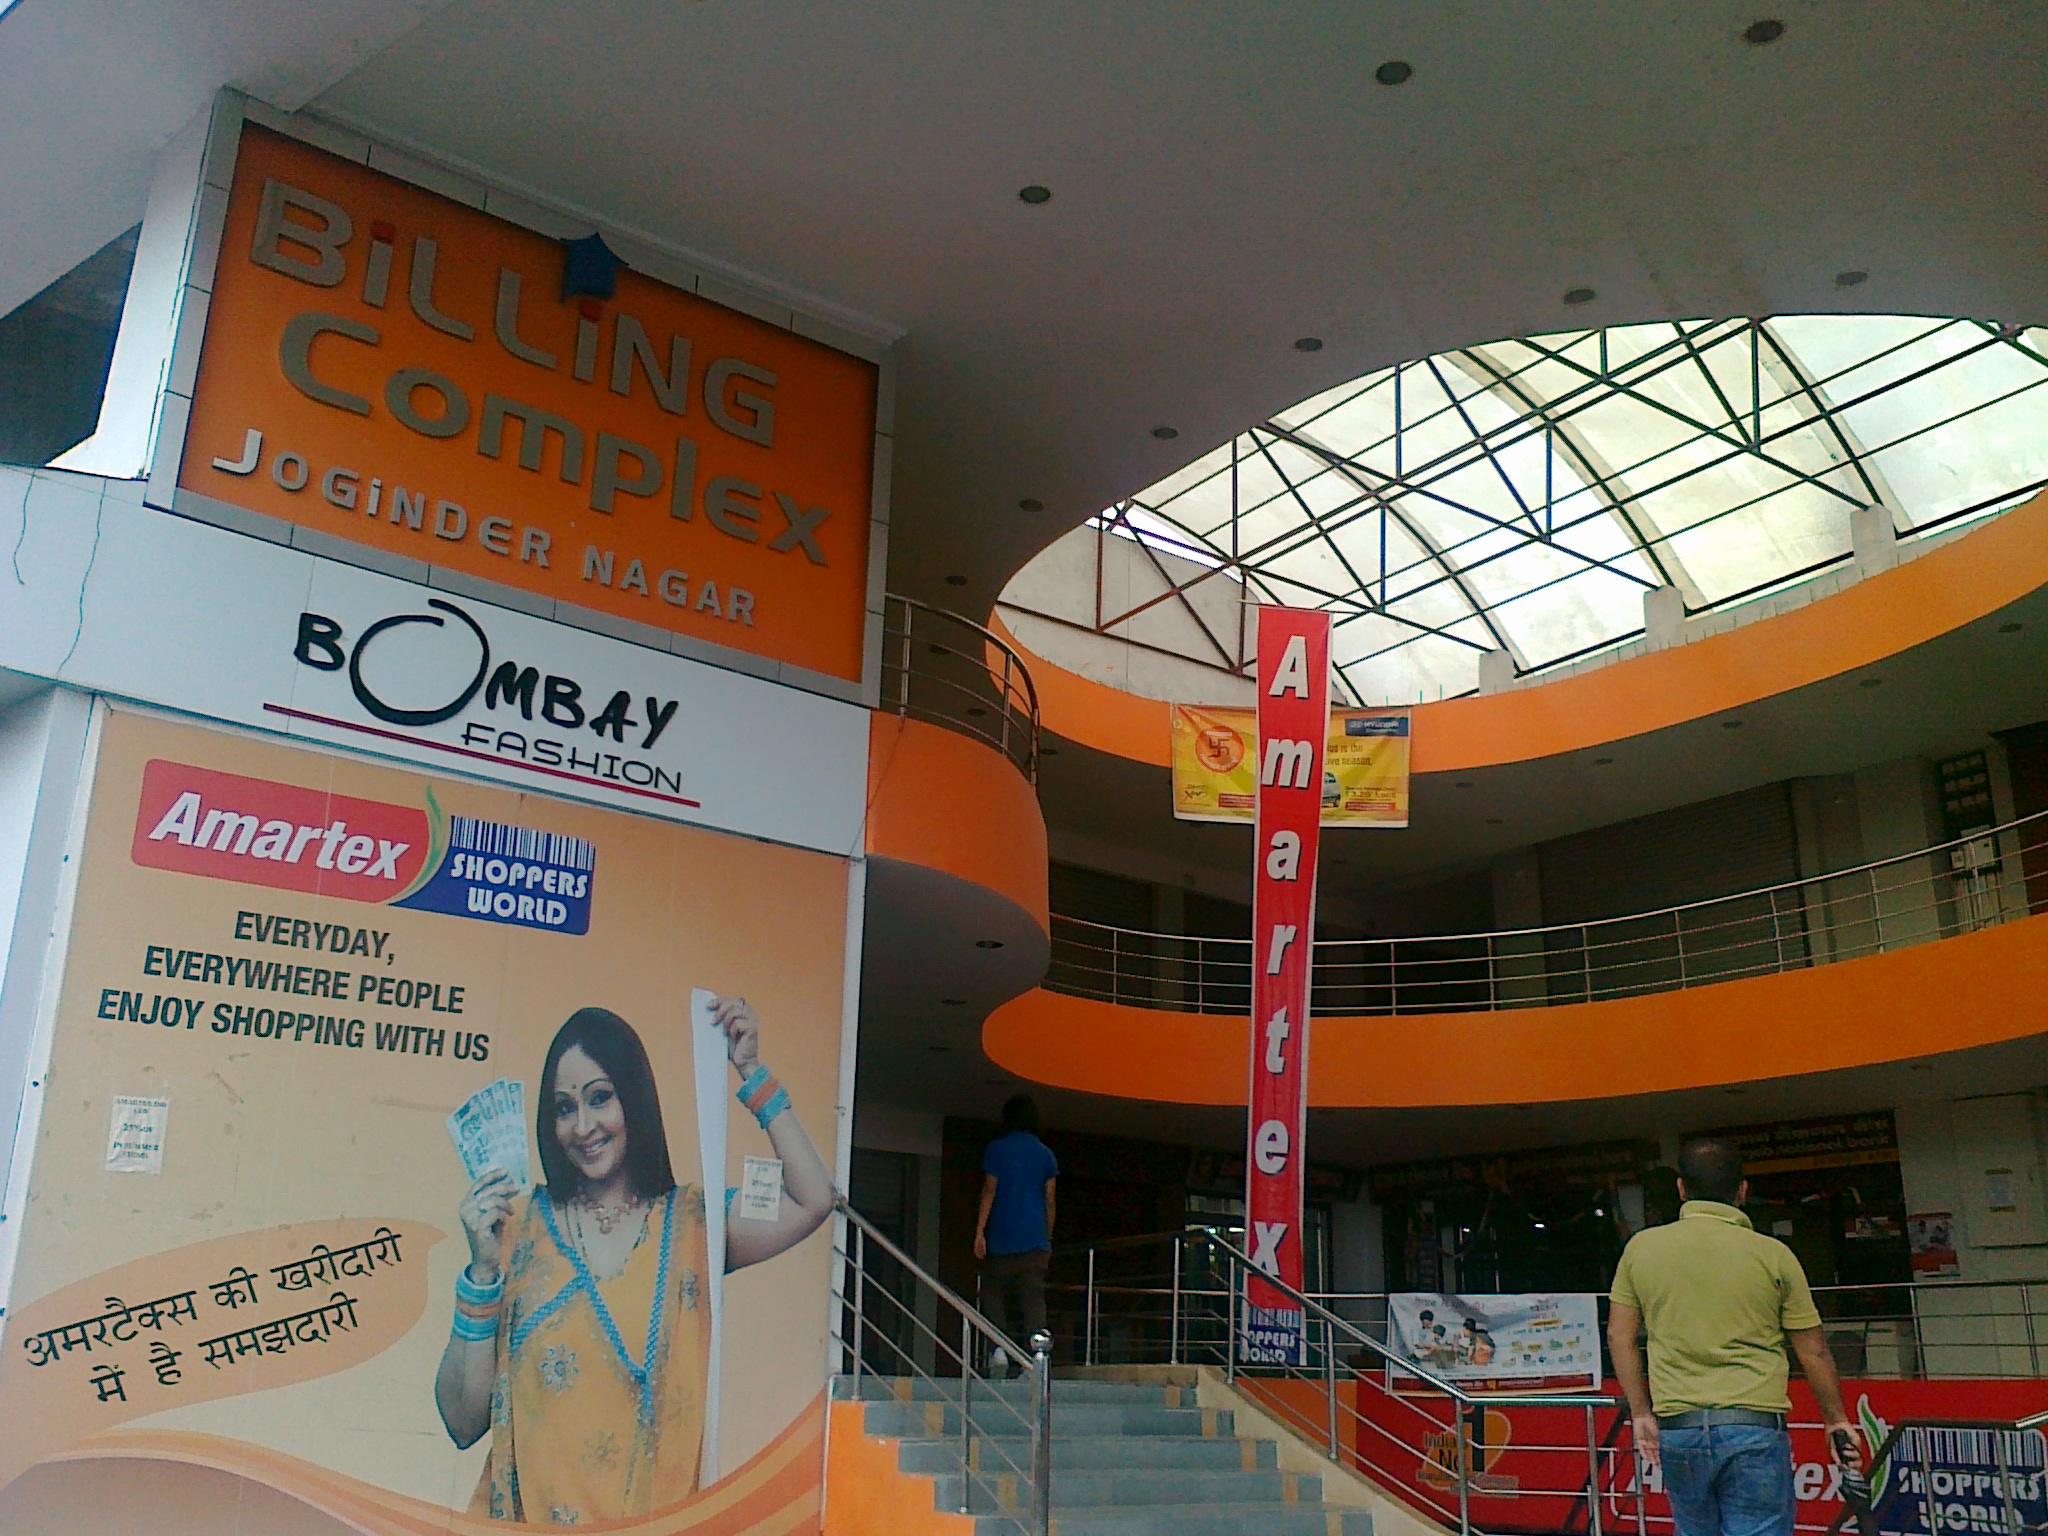 Joginder Nagar shopping center, Mandi District